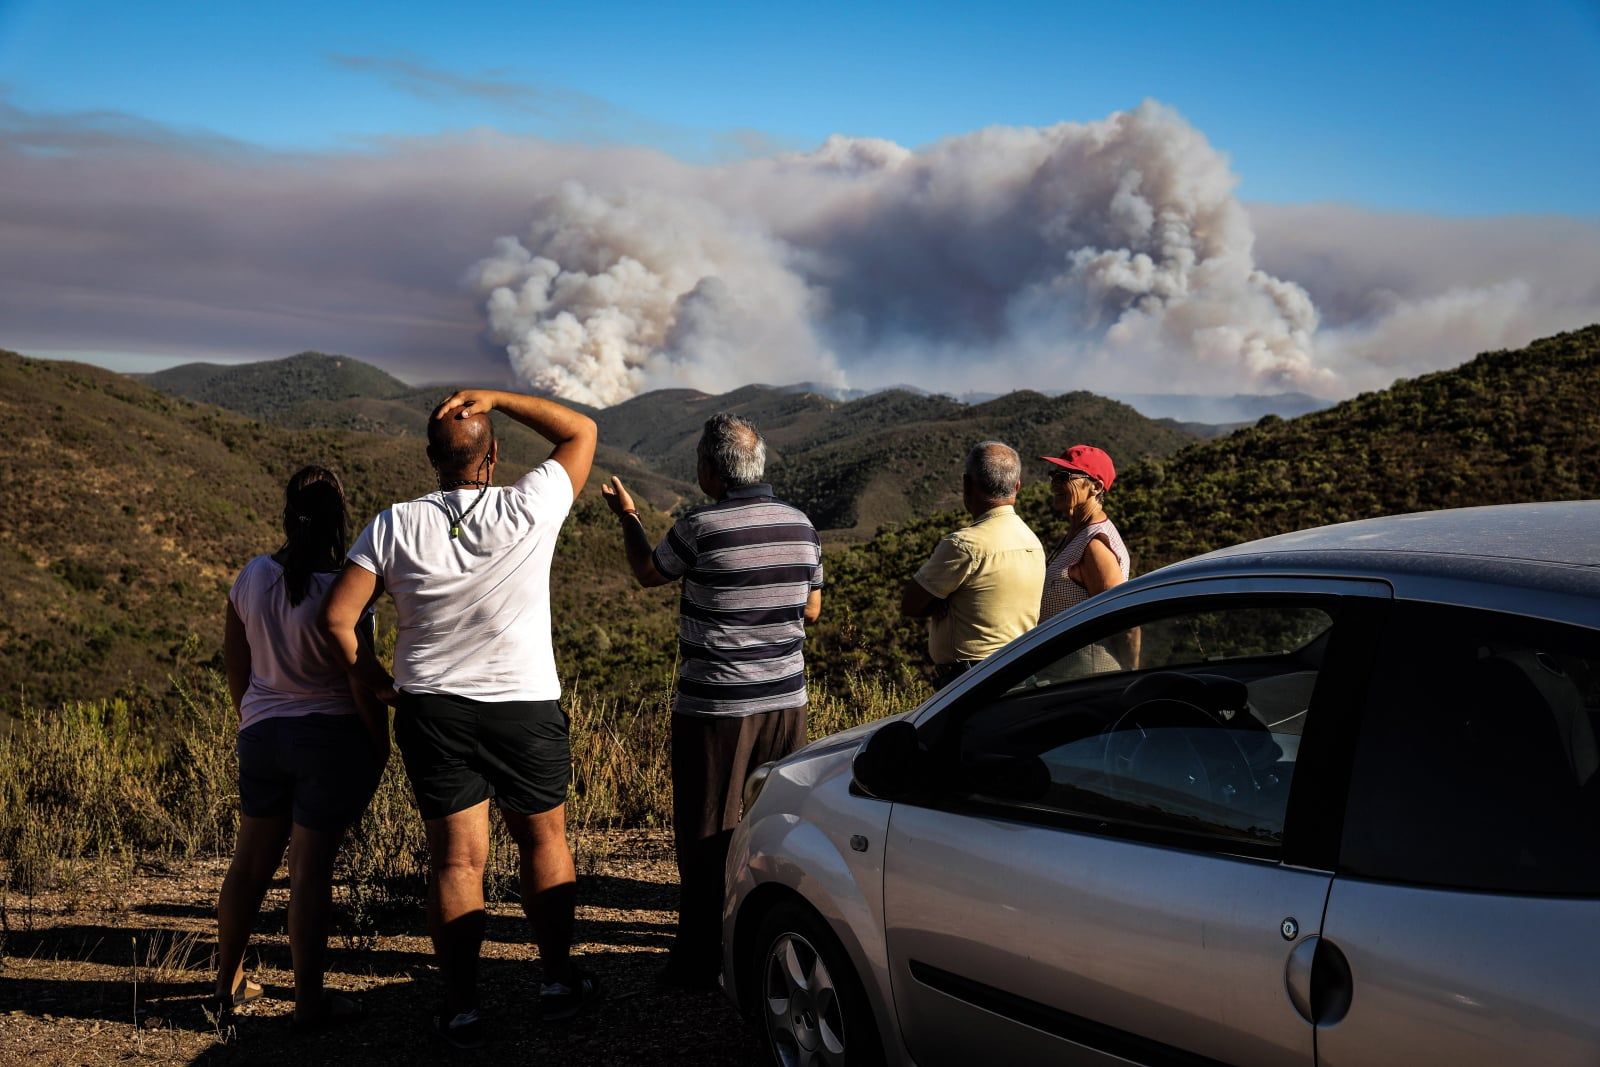 Pożary w Hiszpanii fot. EPA/MIGUEL A. LOPES